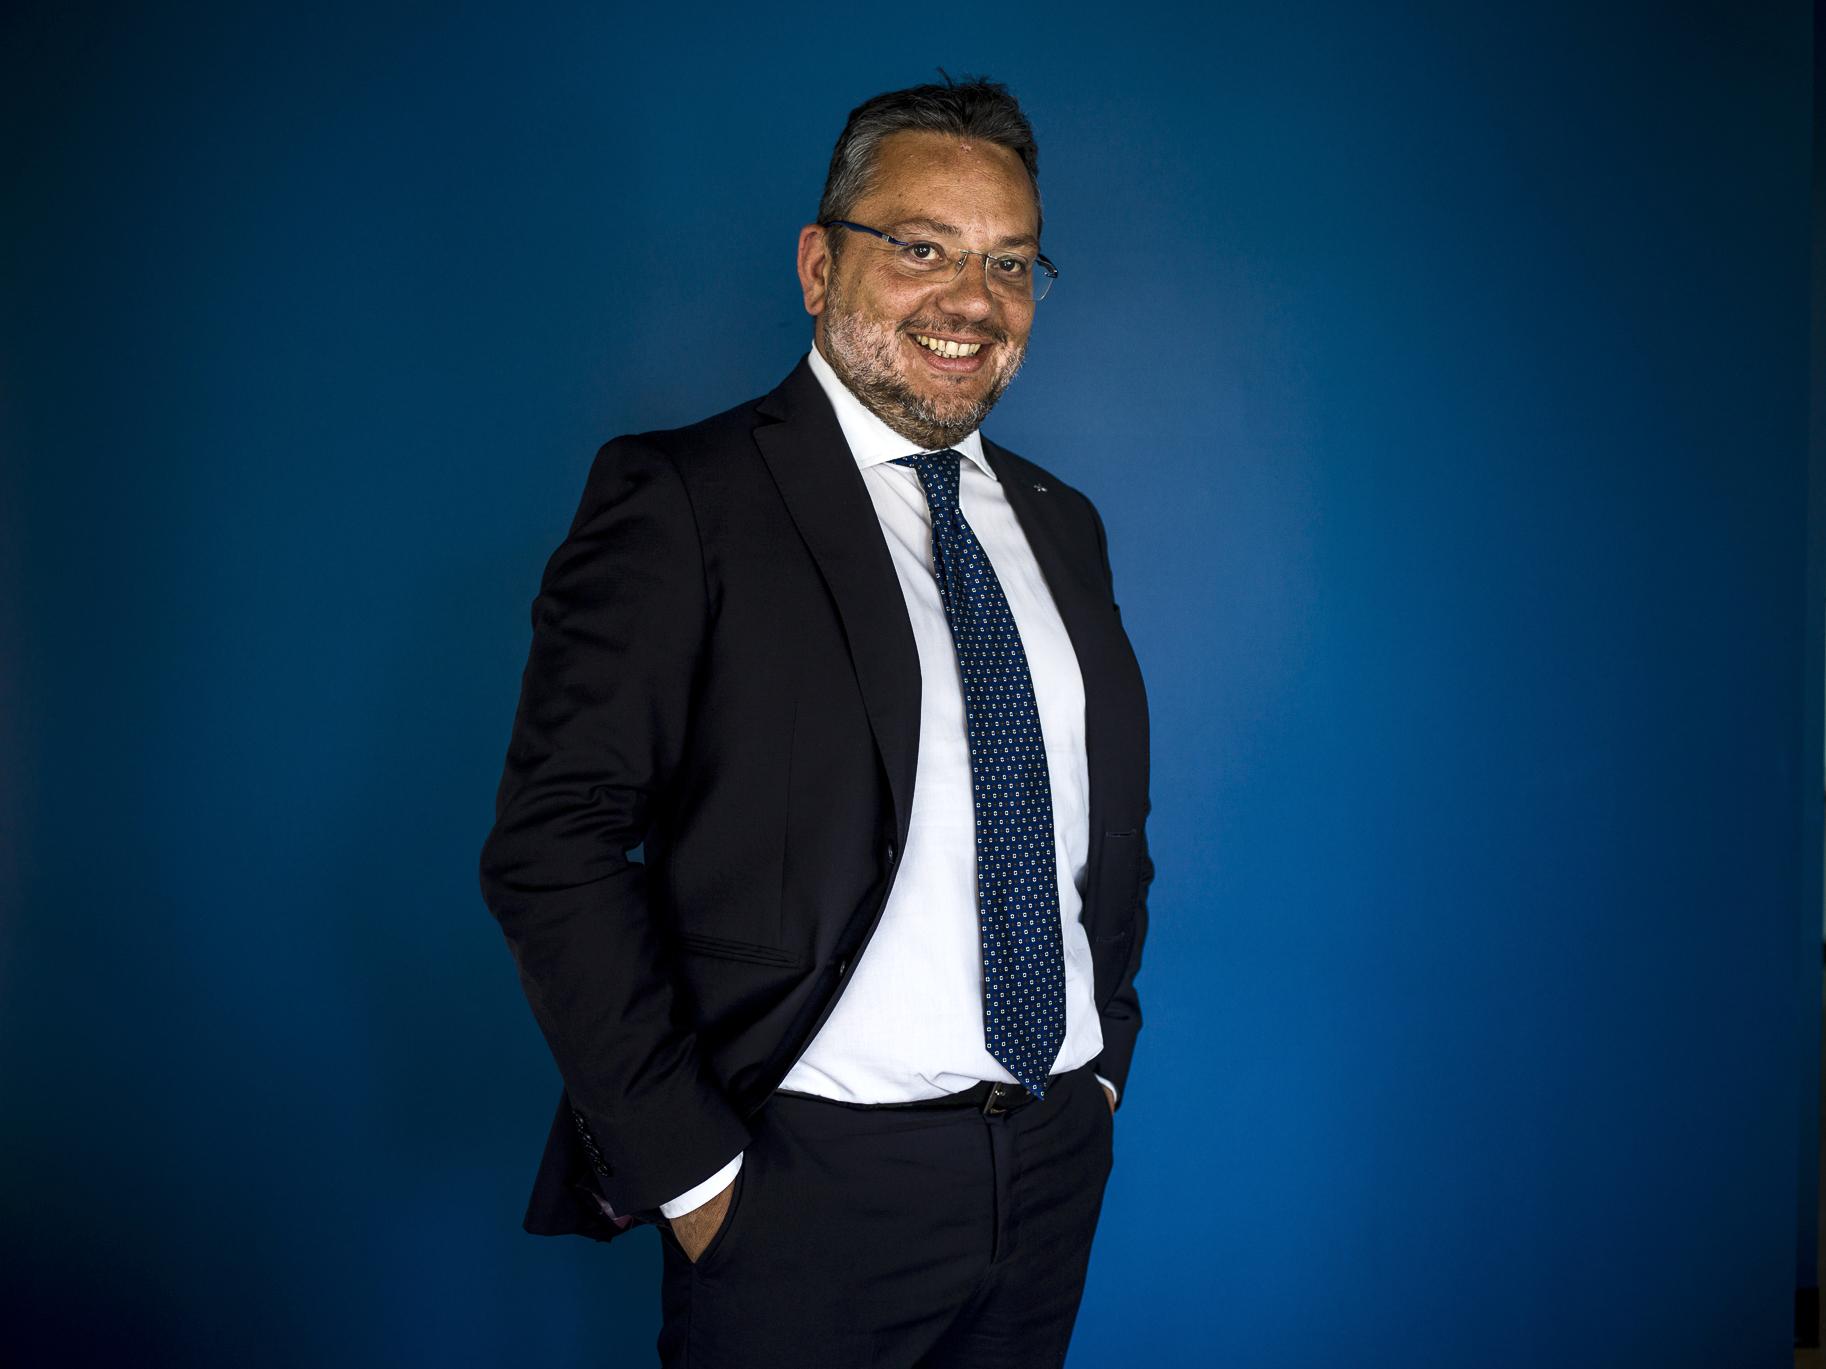 Fernando_Diana_CEO_Citynews-3